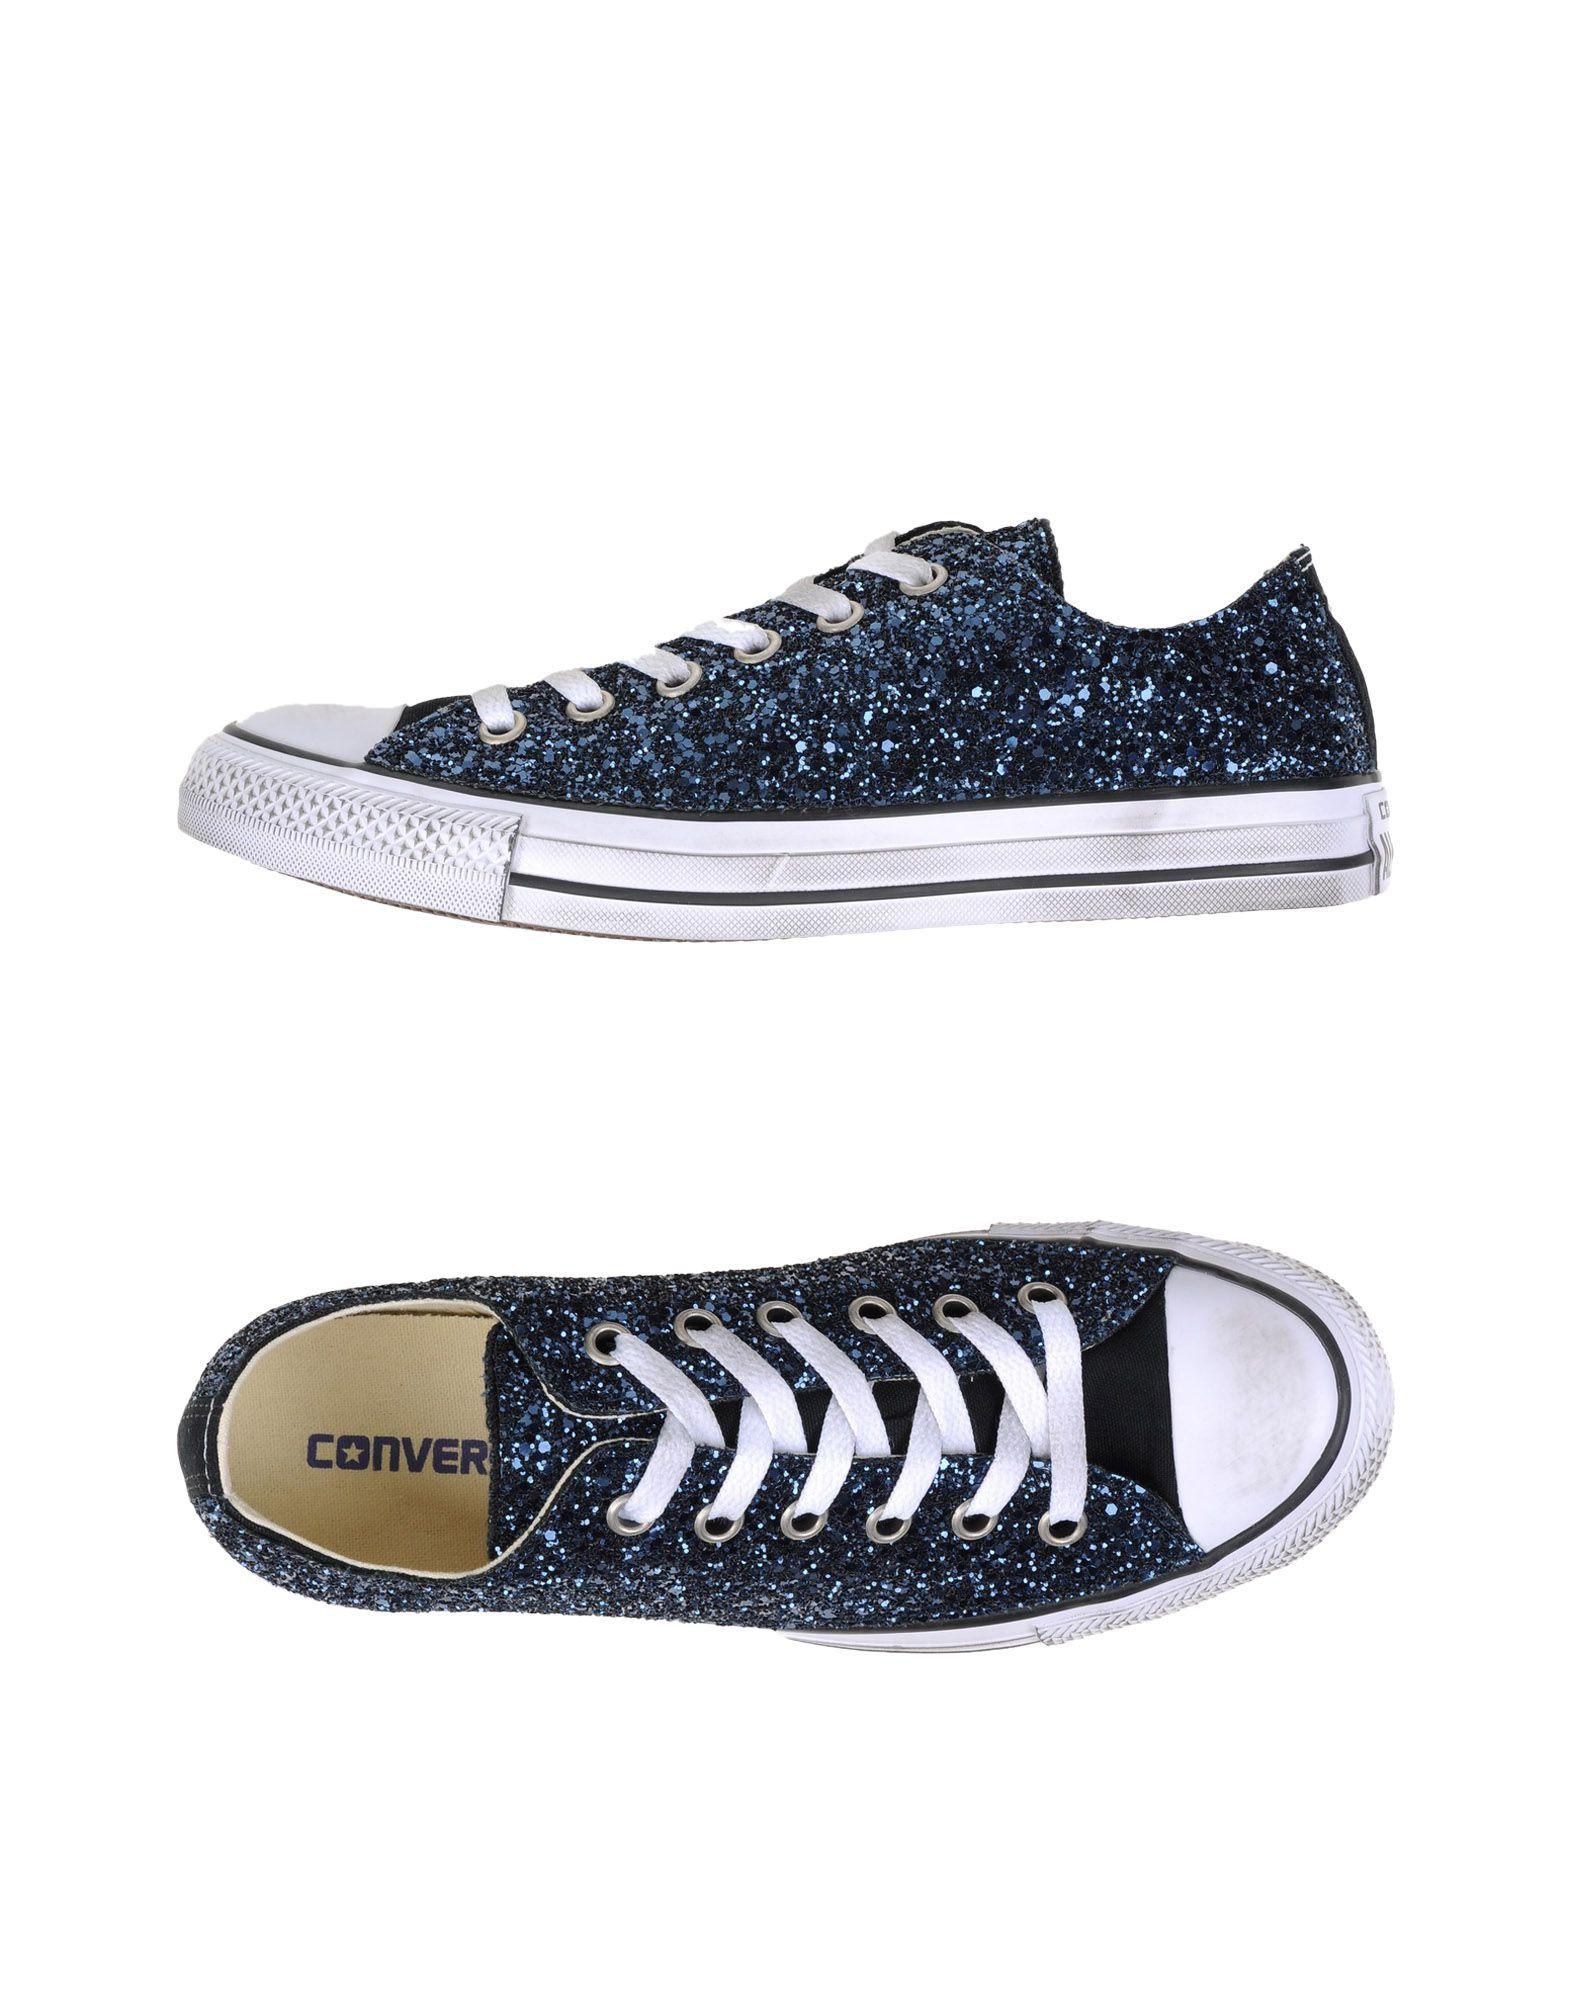 Converse Limited Edition All Star Ox Canvas Ltd  11121973RR Heiße Schuhe